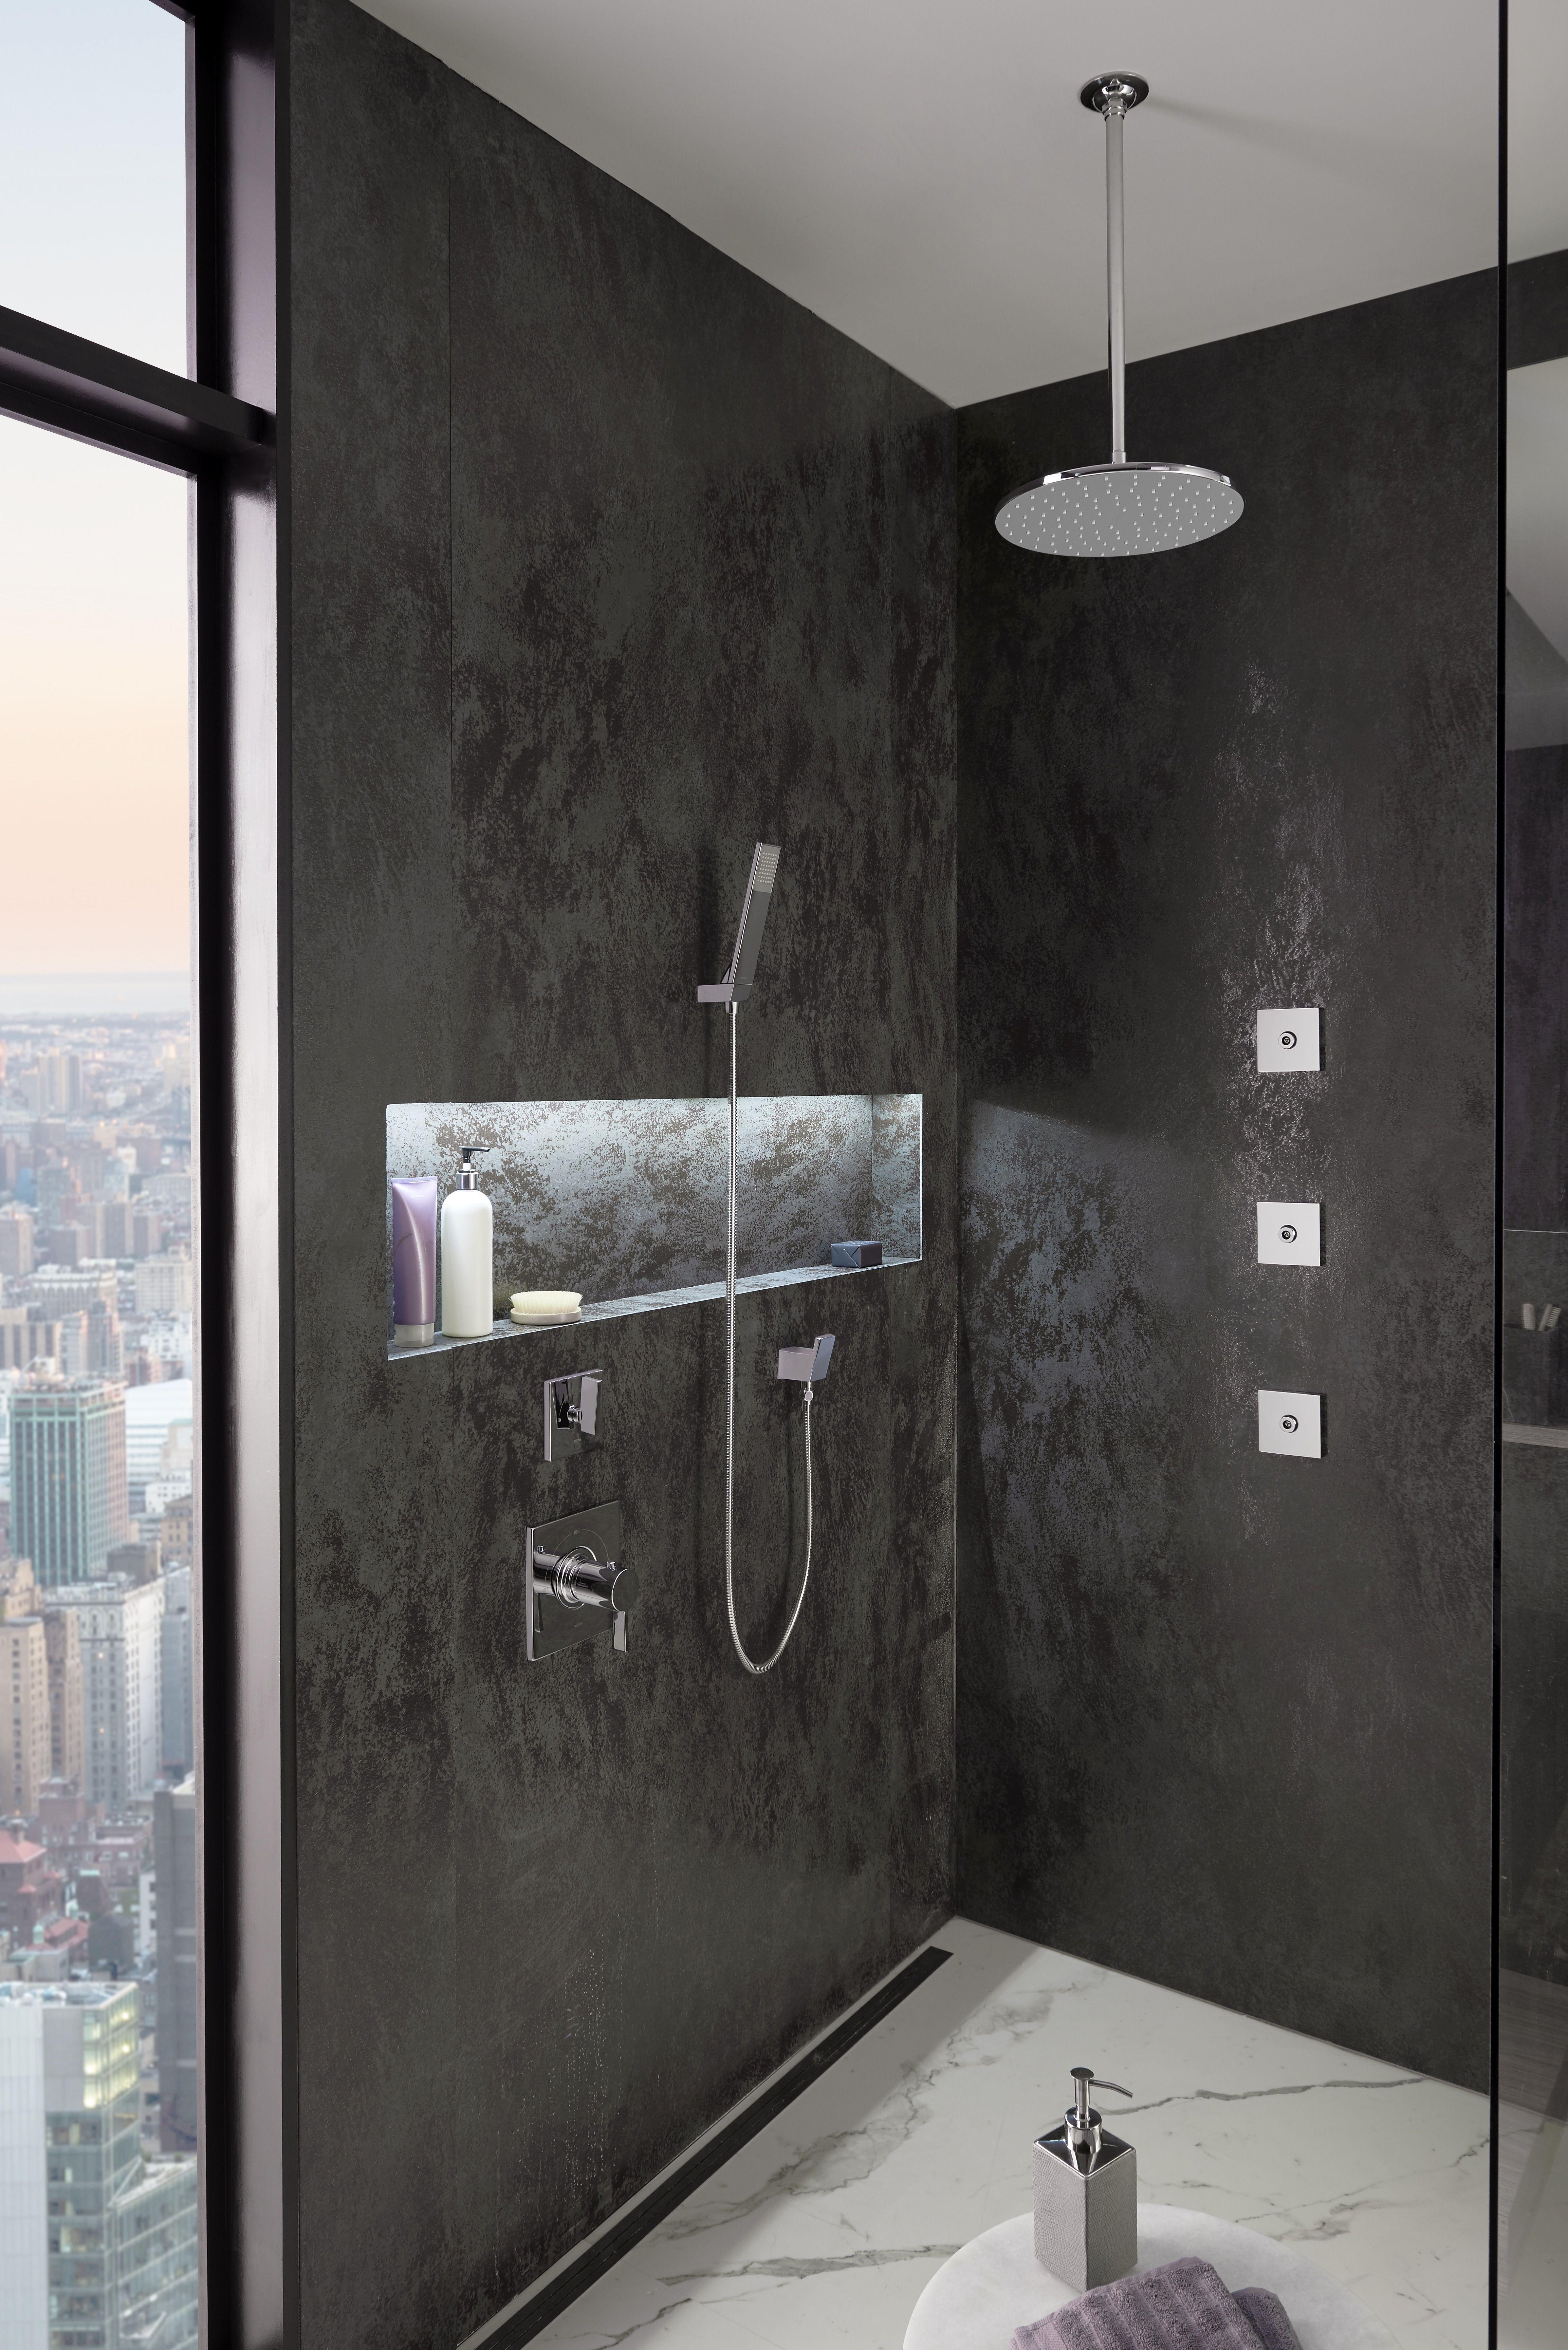 City Views And A Toto Rain Shower Head Are An Invigorating Start To Every Day Bathroom Bathroom Design Inspiration Bathroom Tile Inspiration Modern Bathroom